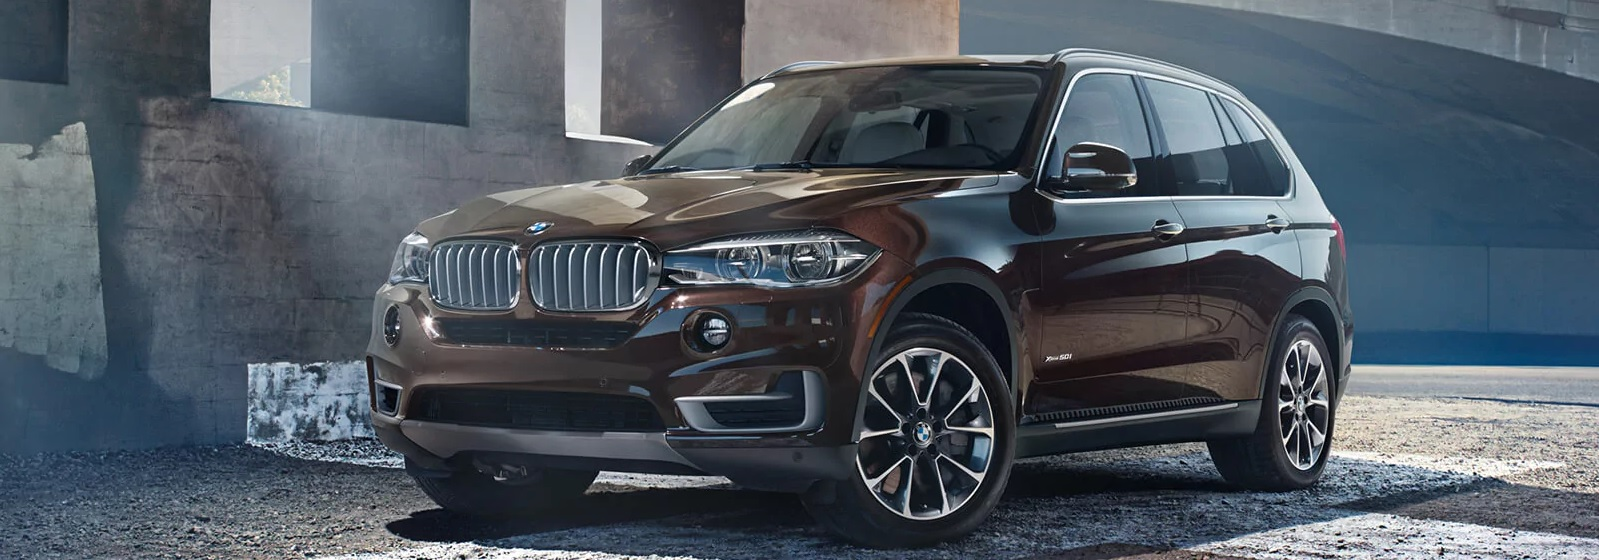 2018 BMW X5 Leasing in Plano, TX - Classic BMW